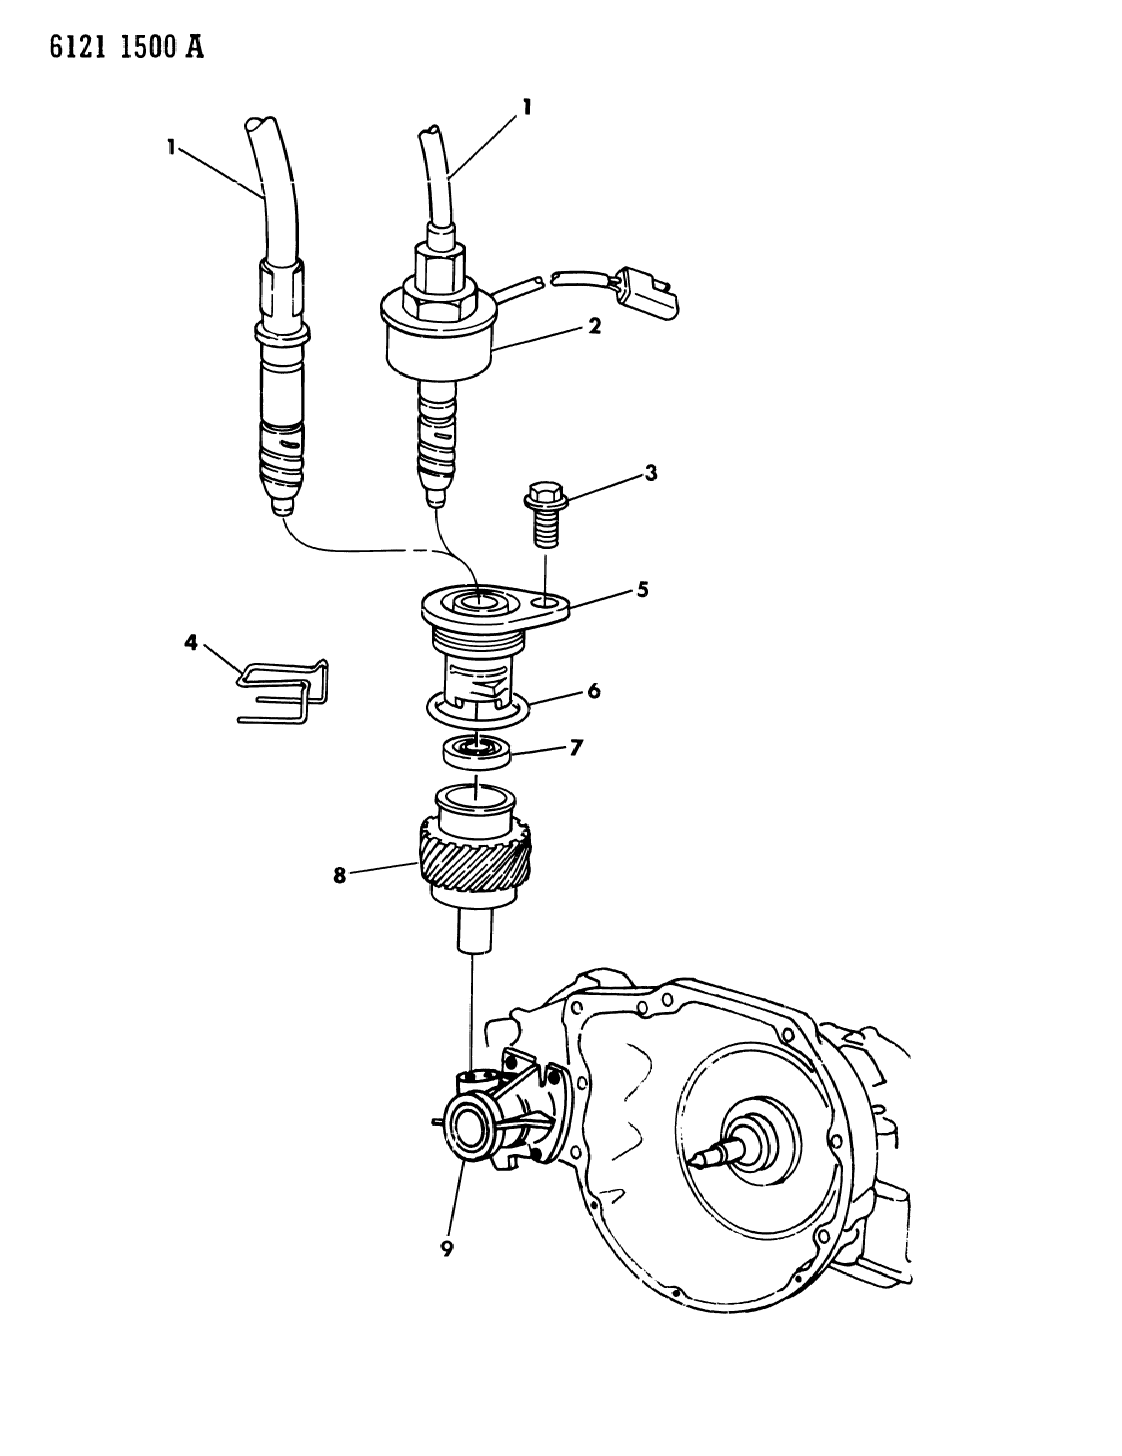 1986 Chrysler LeBaron Base Pinion, Speedometer Cable Drive